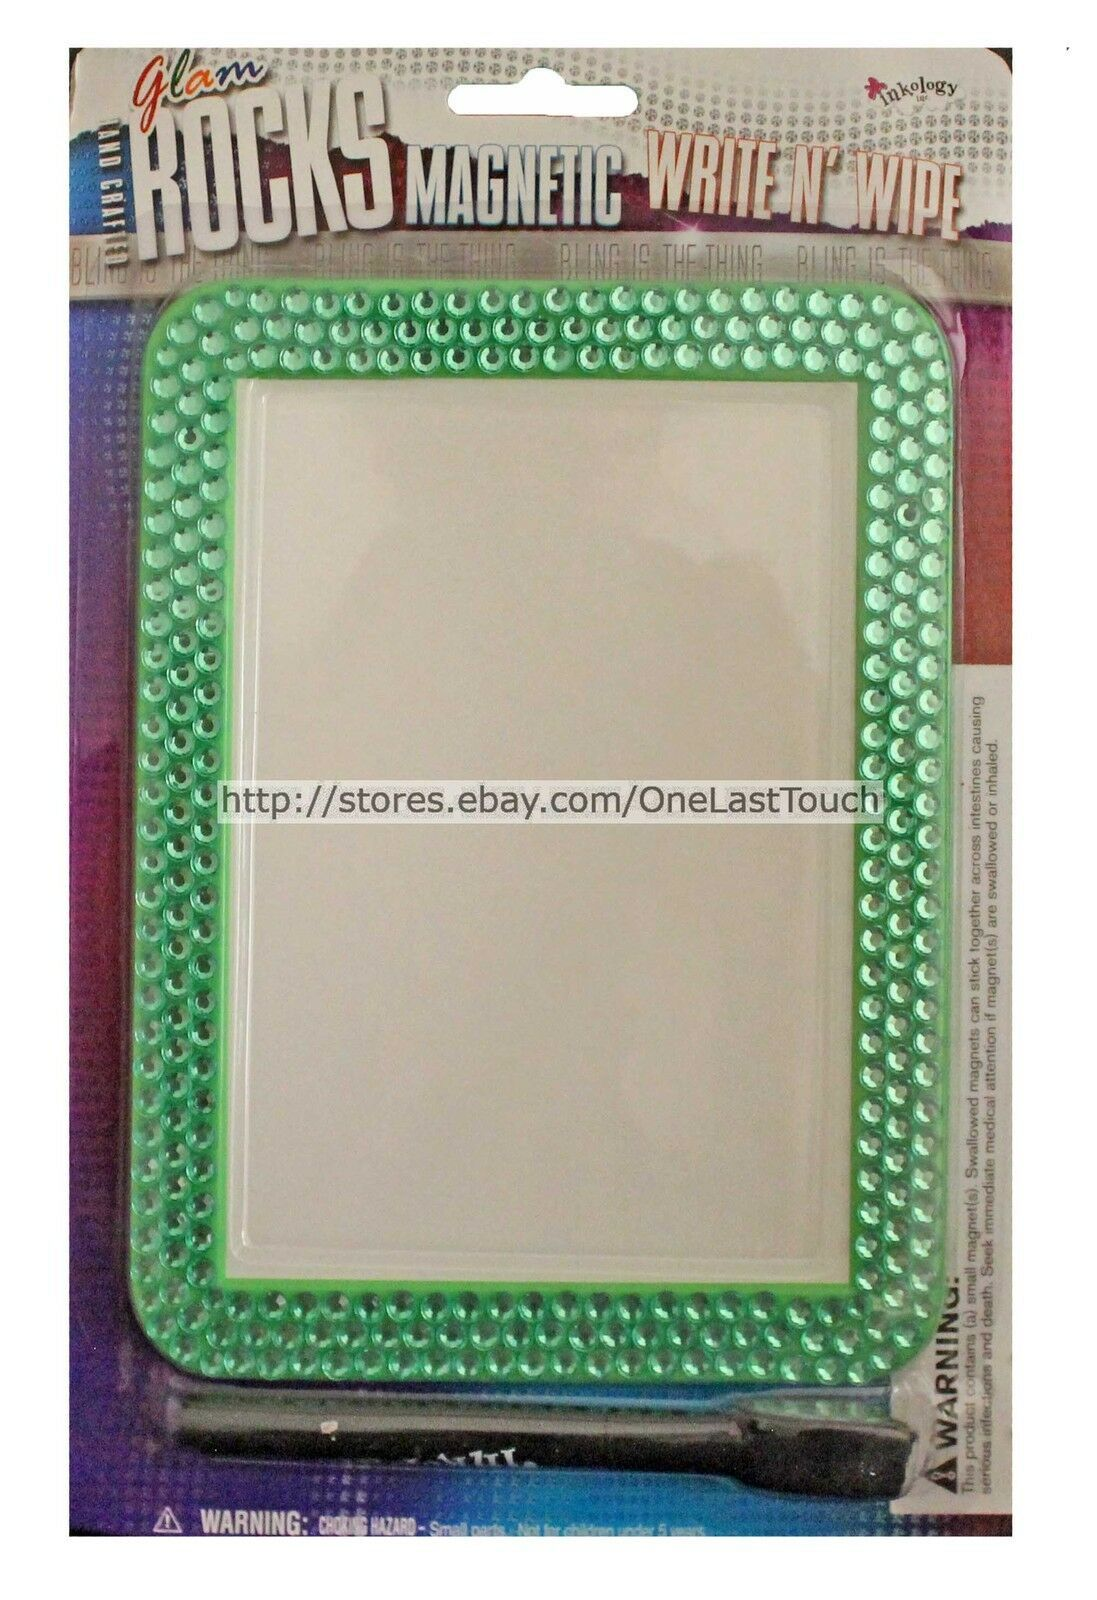 GLAM ROCKS* Hand Crafted GREEN BLING Rhinestones MAGNETIC WRITE N WIPE Dry Erase